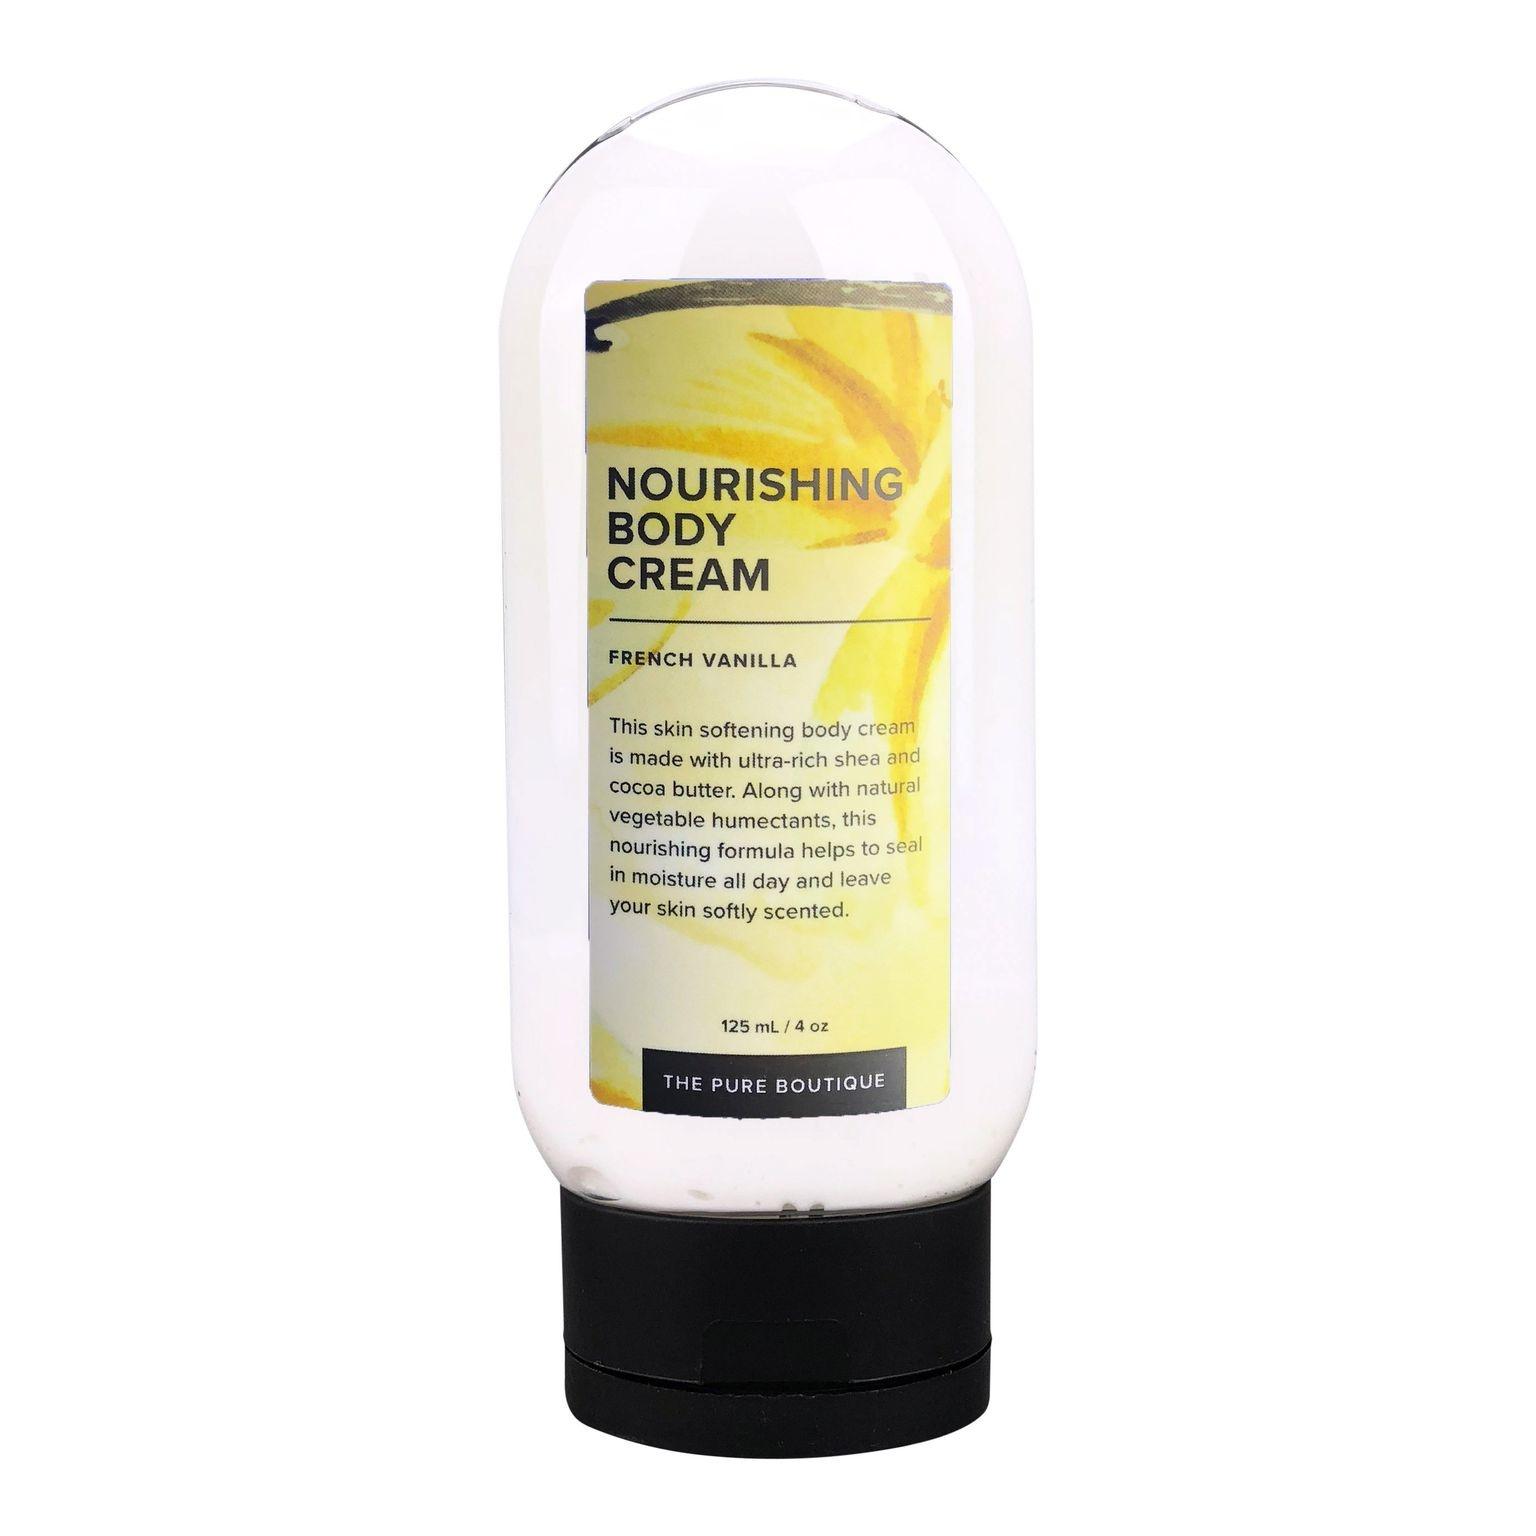 Nourishing Body Cream - French Vanilla-1